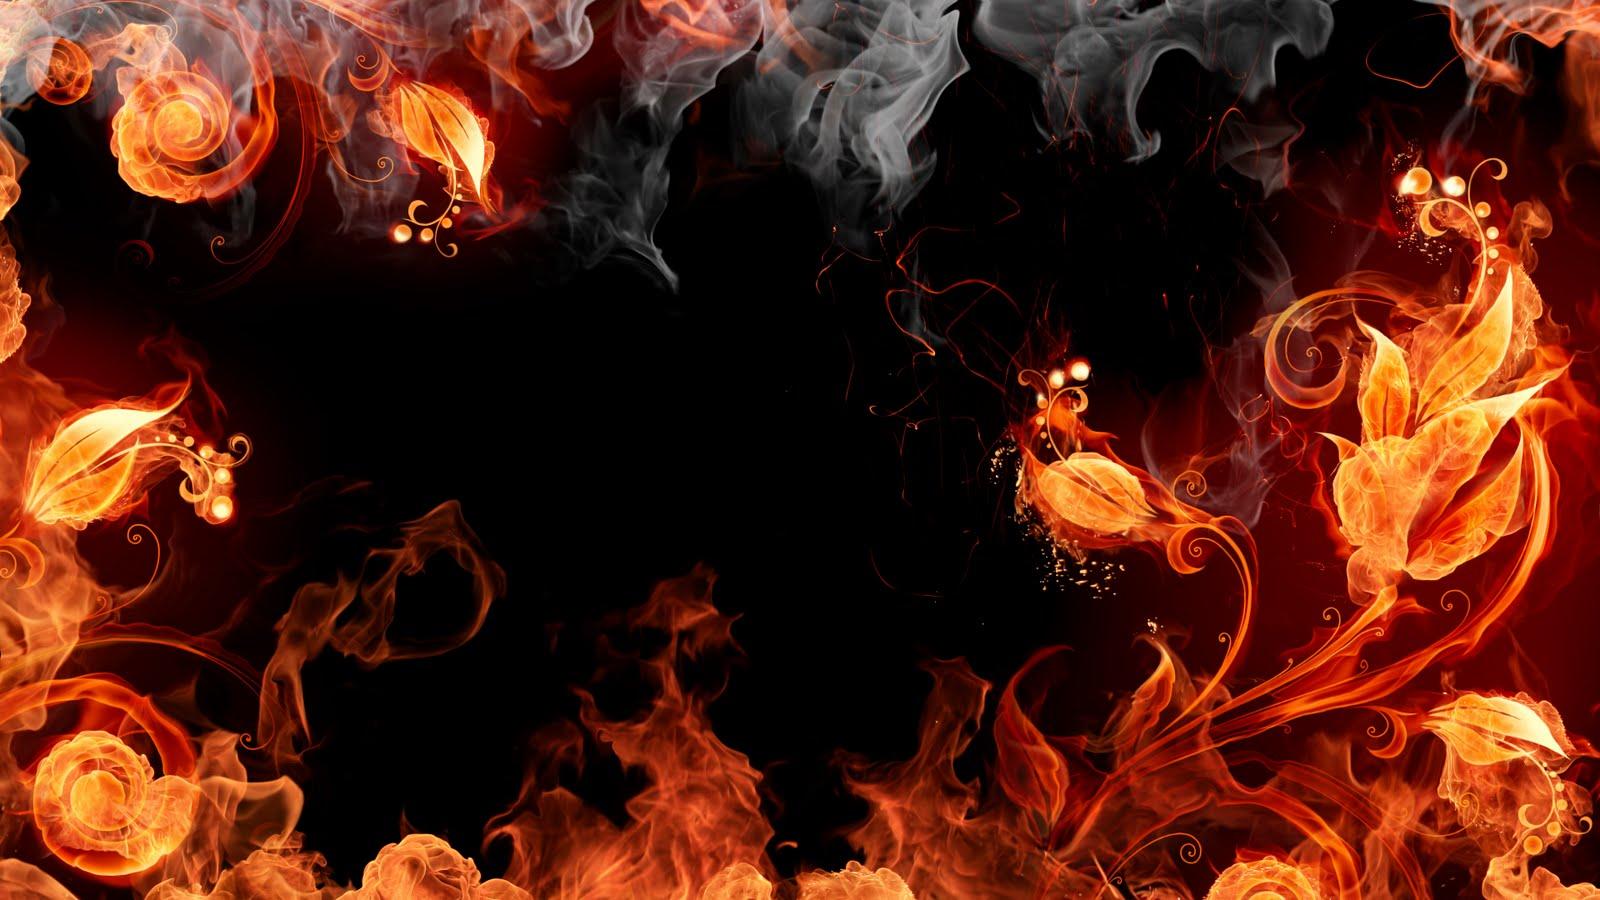 hd wallpapers desktop fire - photo #19